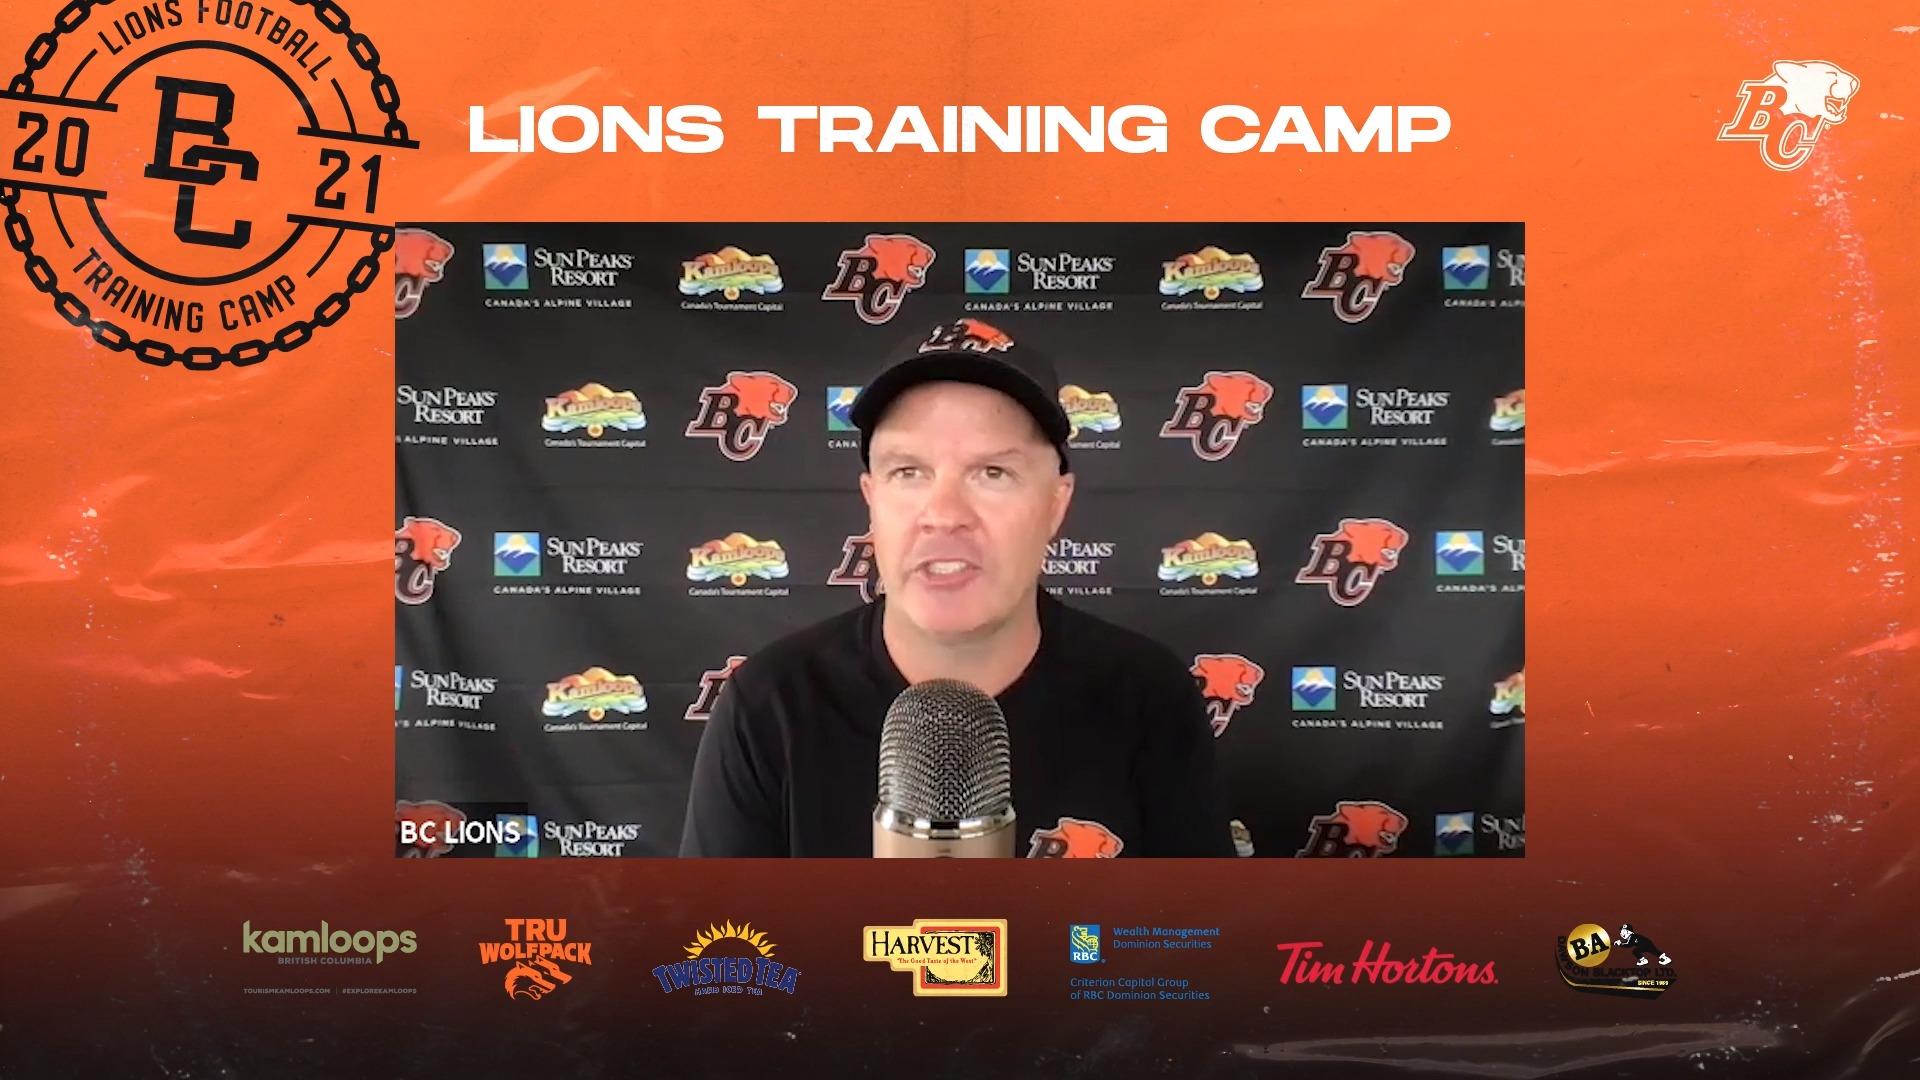 Training Camp July 24 | Rick Campbell